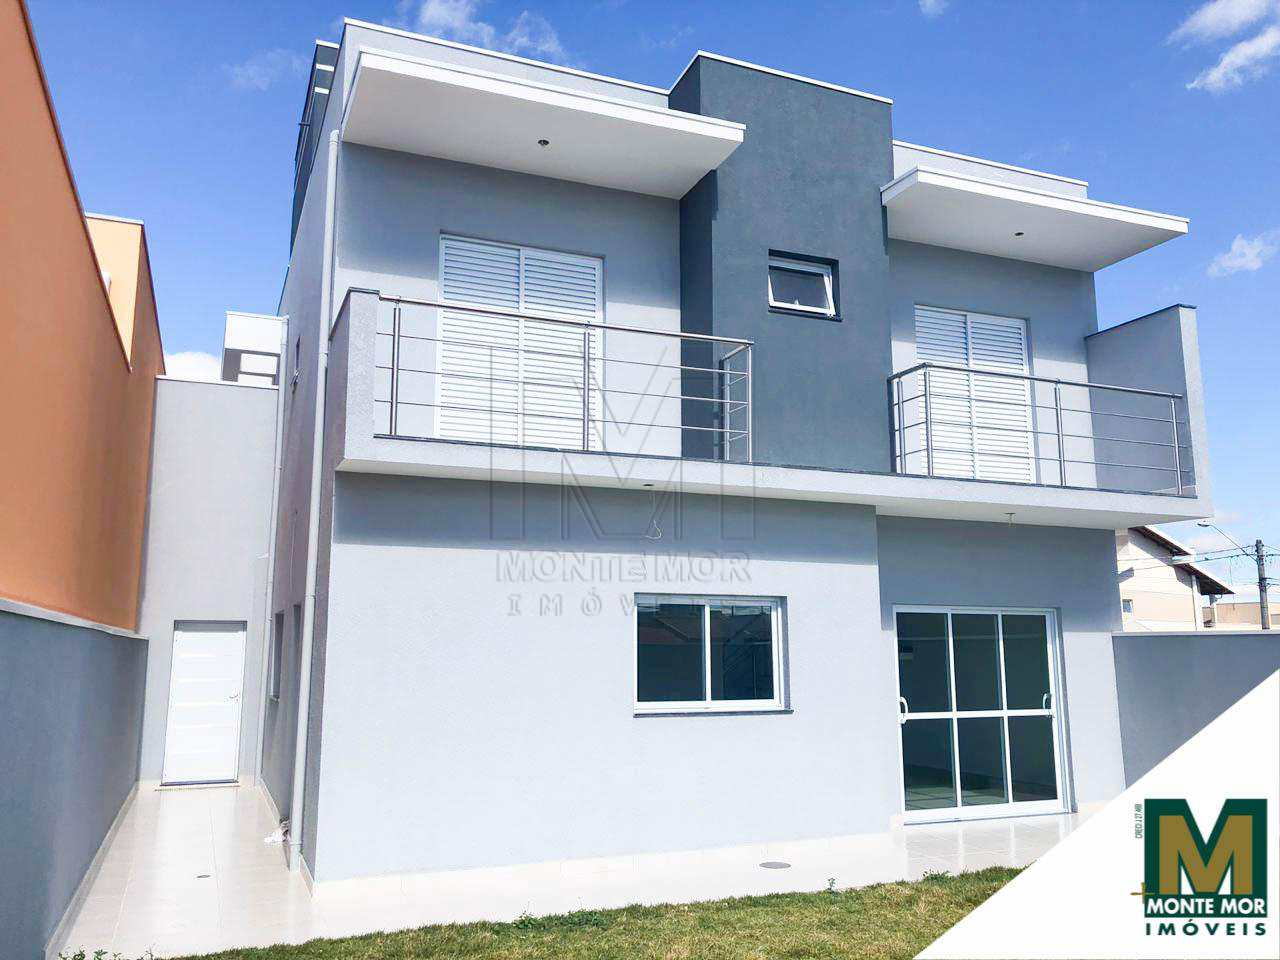 Casa de Condomínio com 3 dormitórios - Condomínio Golden Park